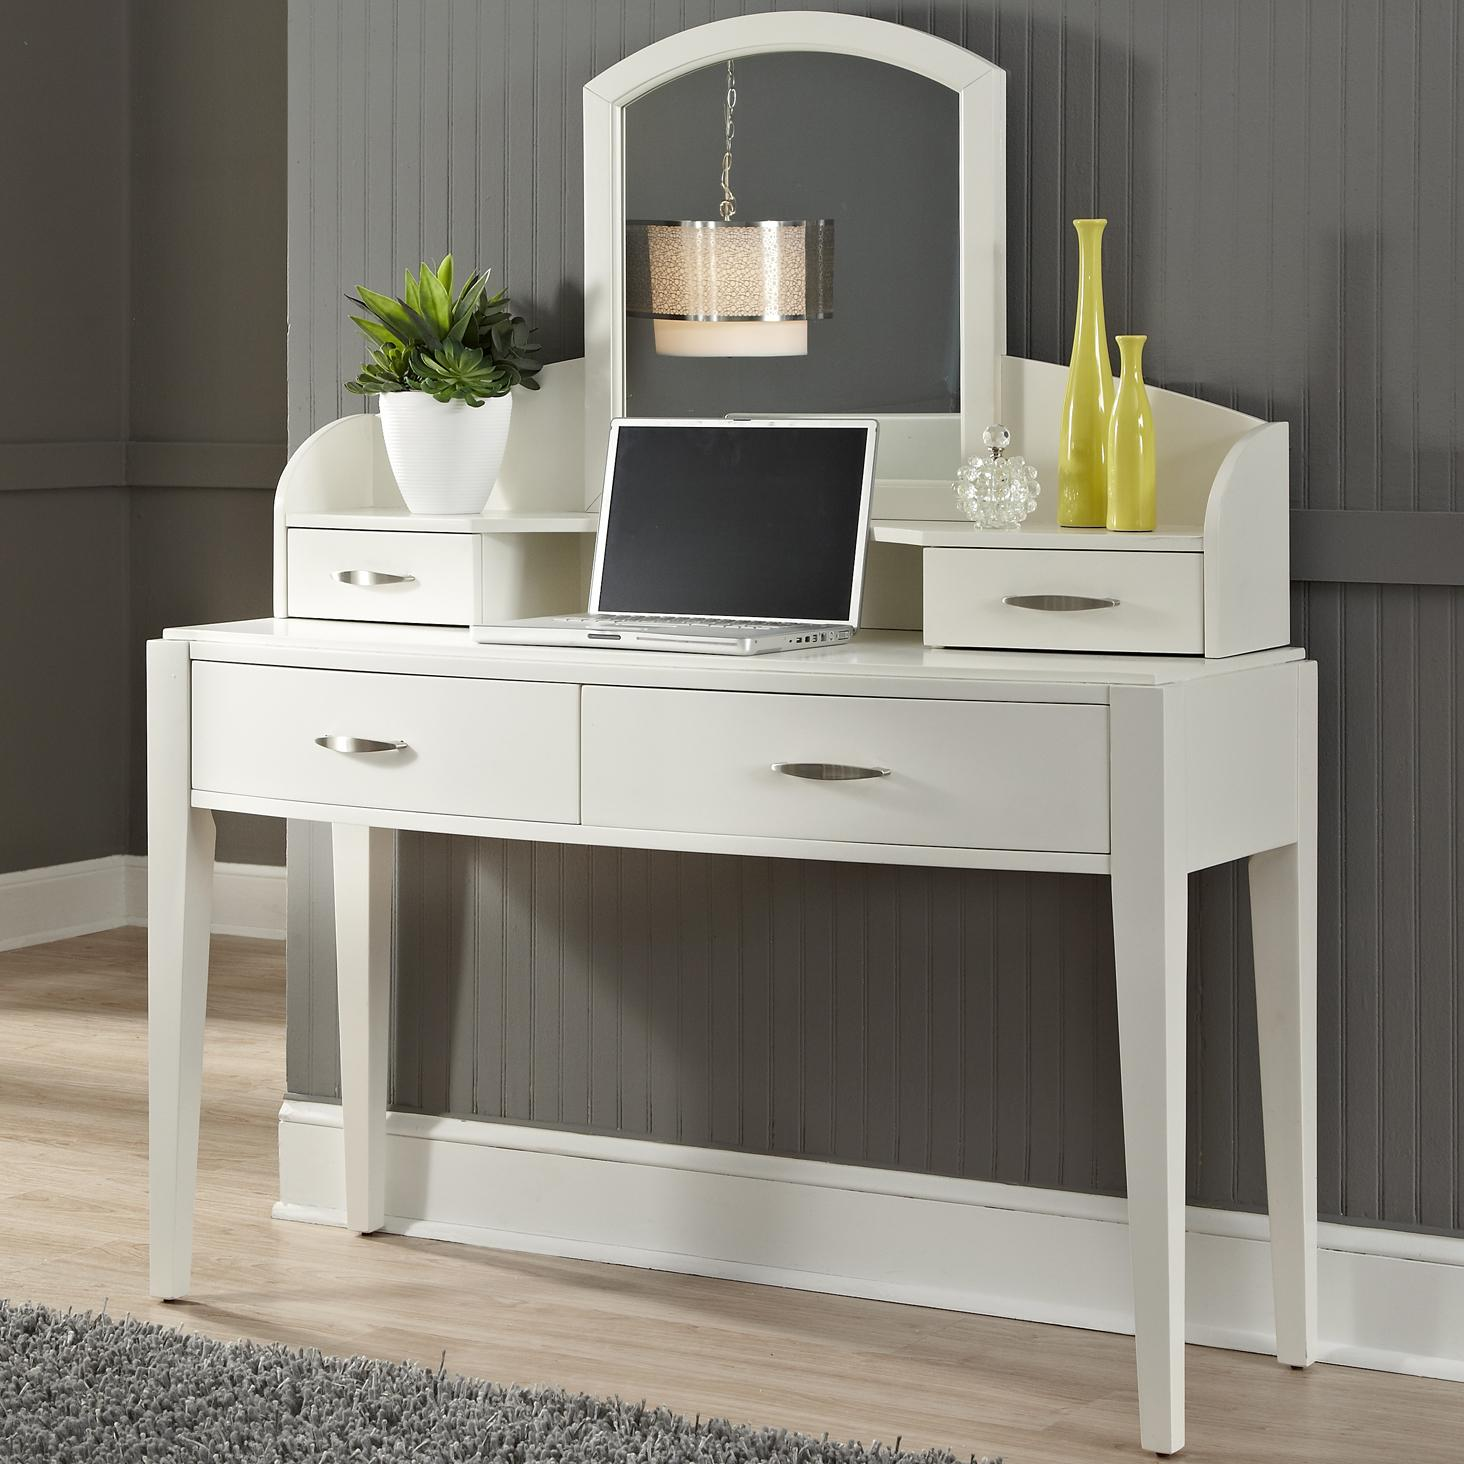 Liberty Furniture Avalon II Vanity - Item Number: 205-YBR-SD